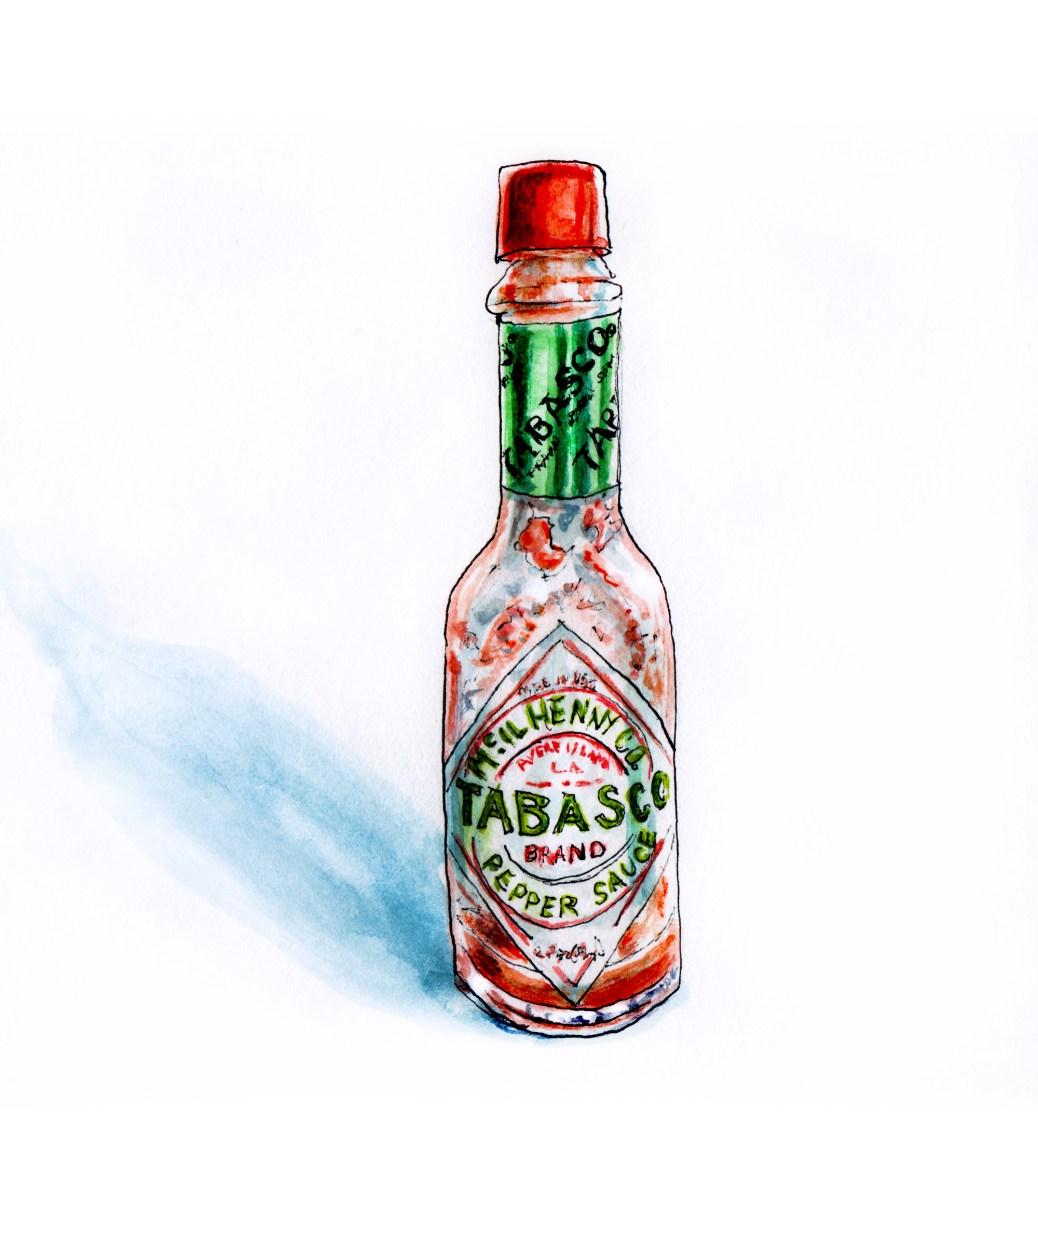 #WorldWatercolorGroup - Tabasco Hot Pepper Sauce Bottle Watercolor - #doodlewash